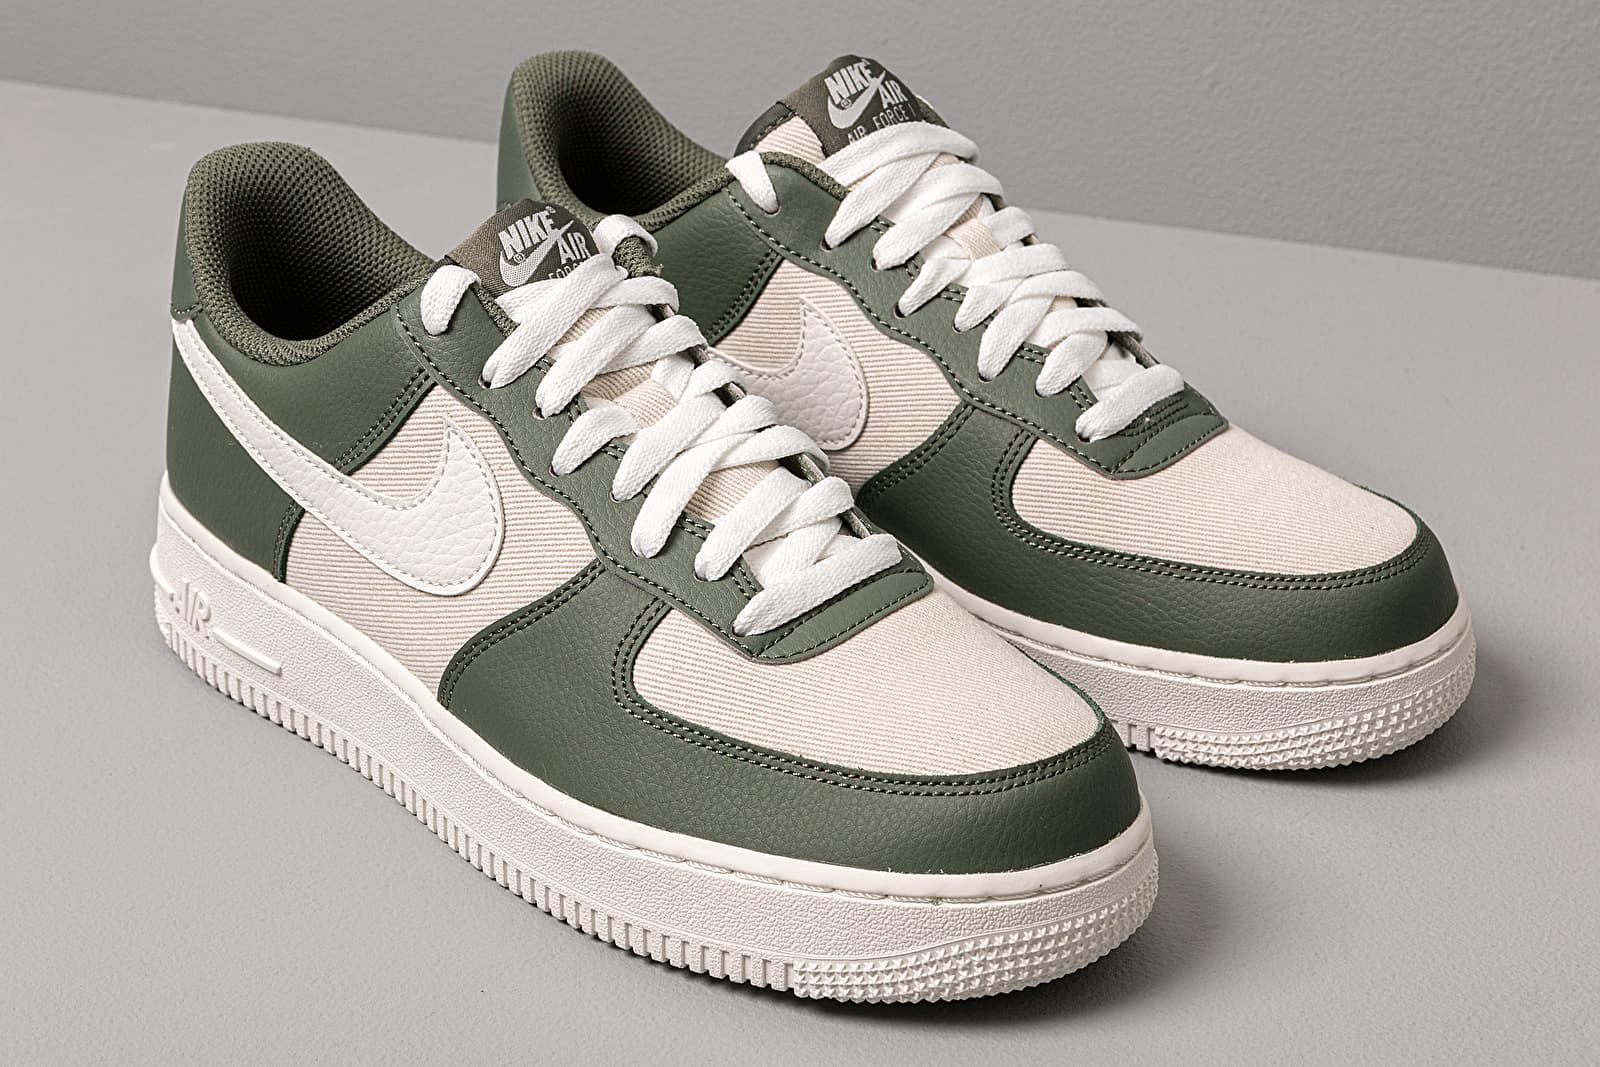 Nike Air Force 1 07 Juniper Fog